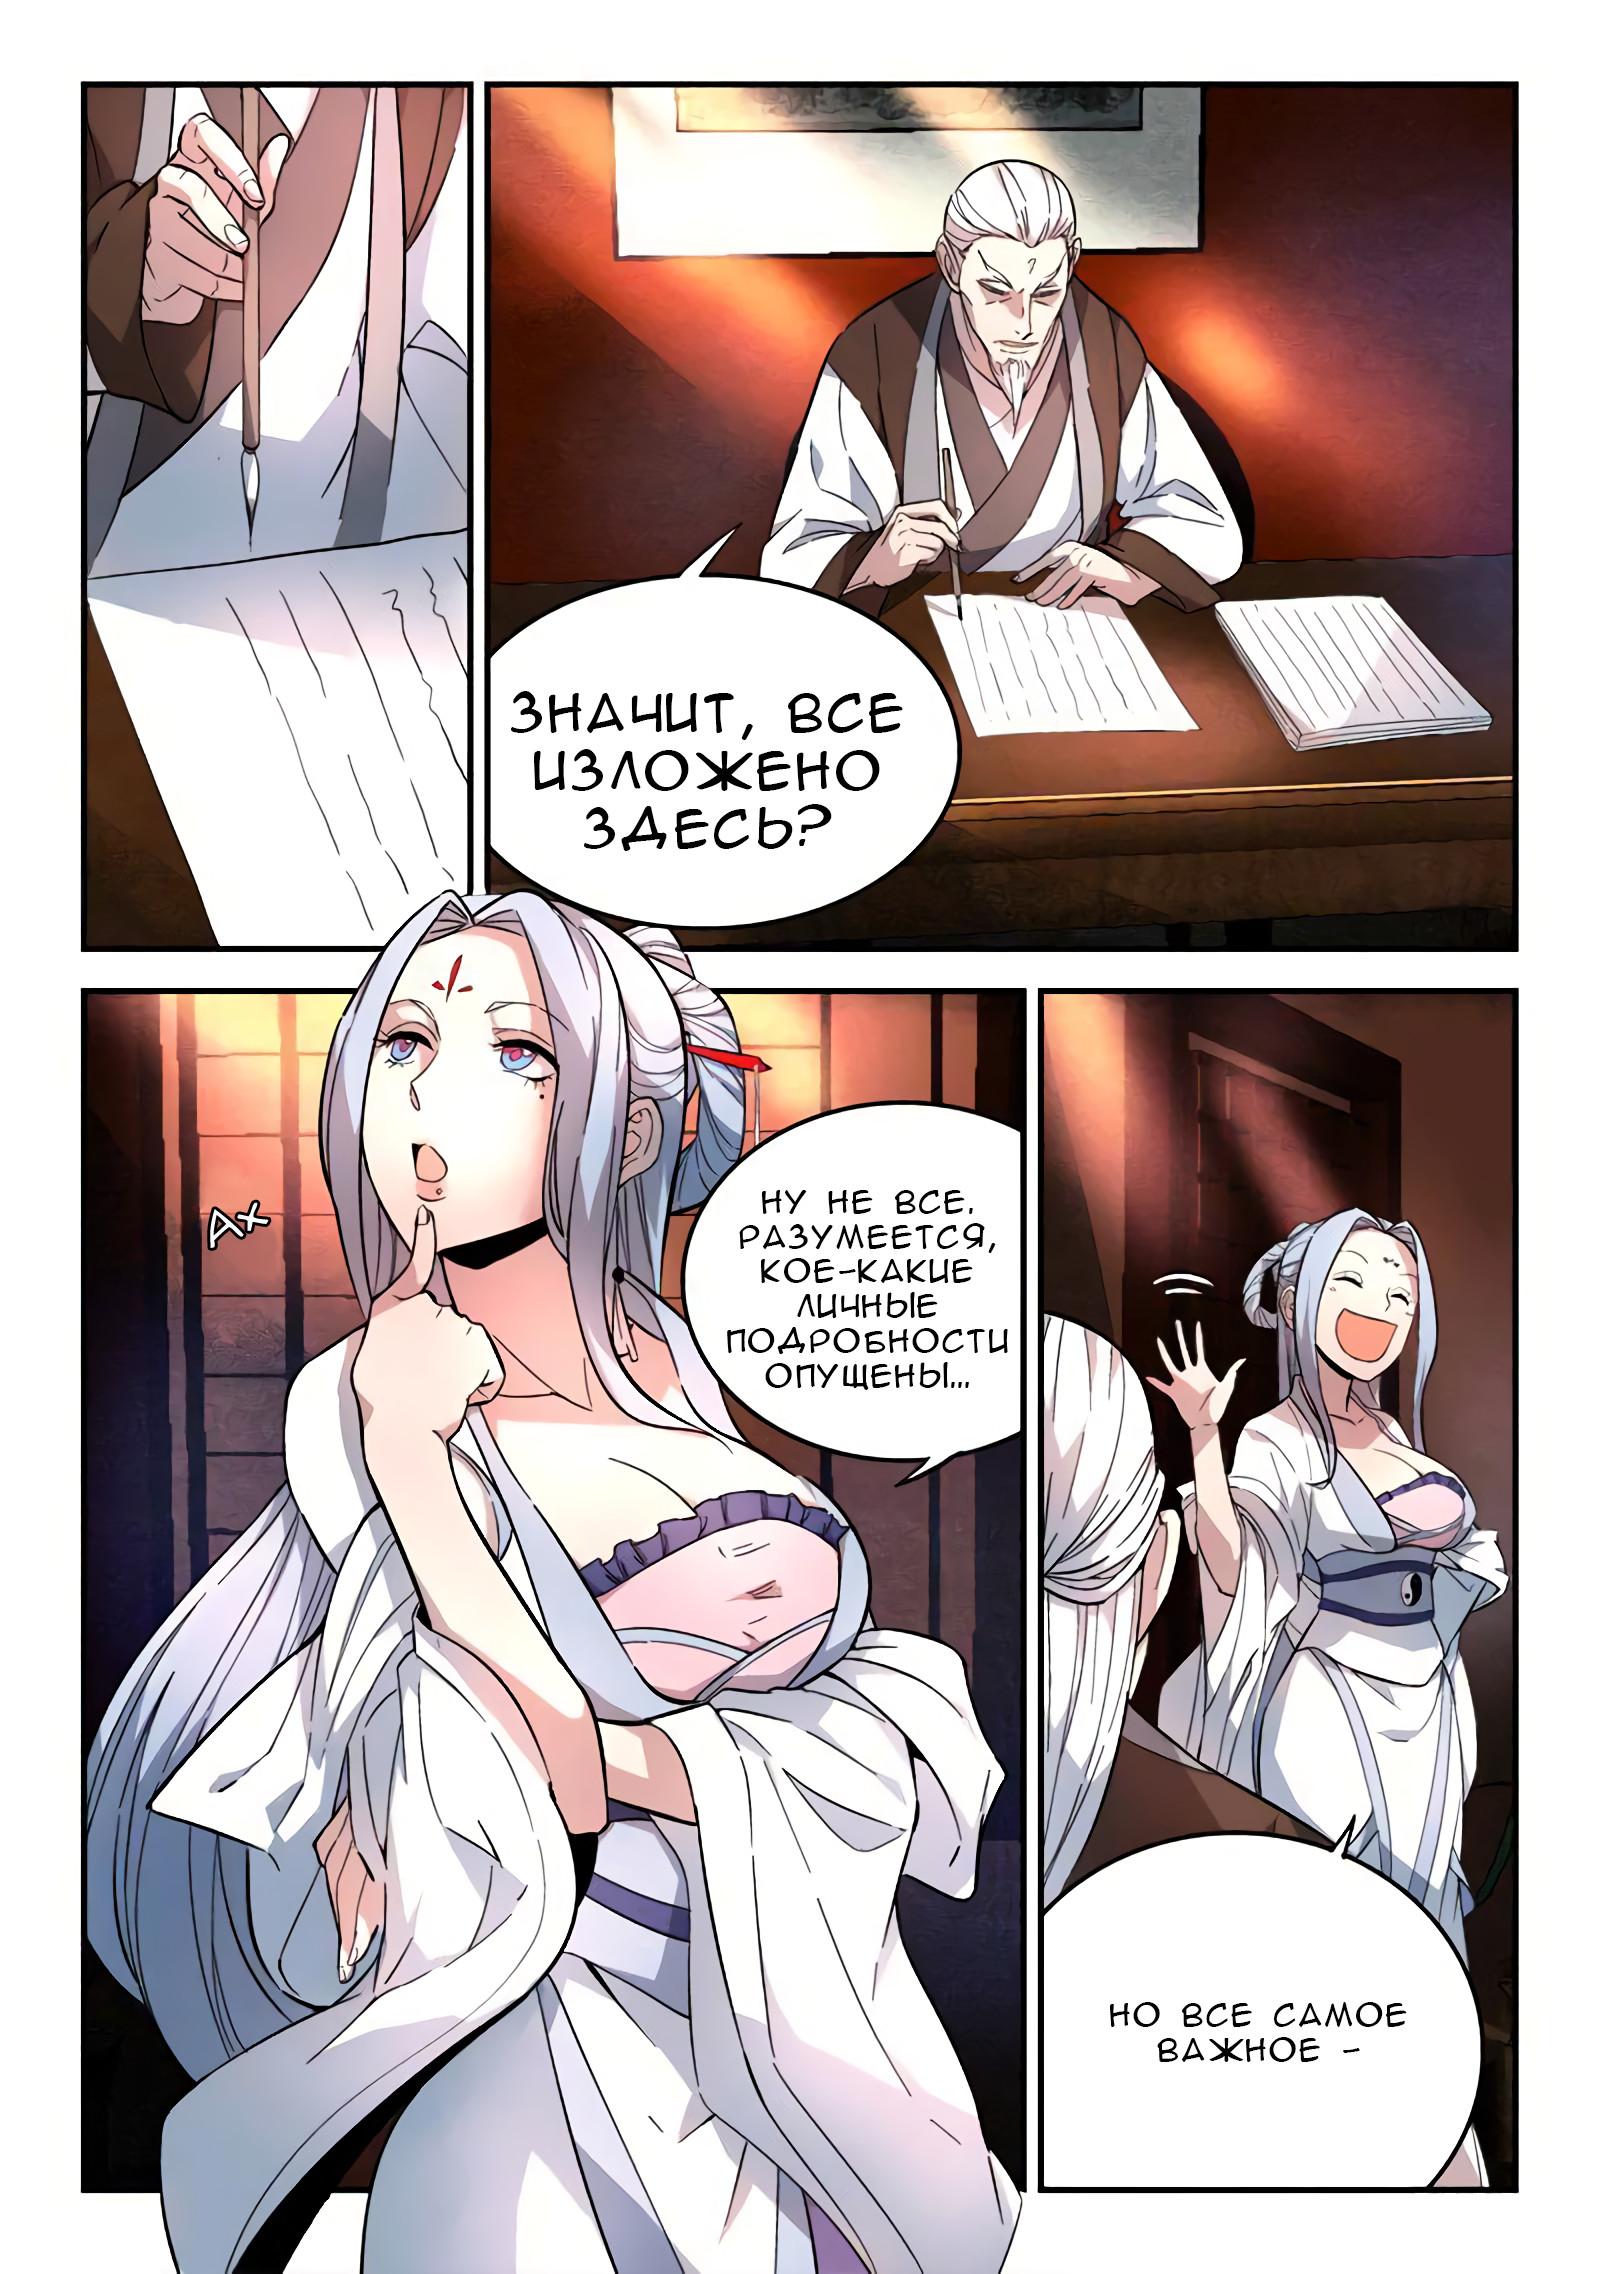 https://r1.ninemanga.com/comics/pic2/37/28197/389441/1513926315964.jpg Page 2